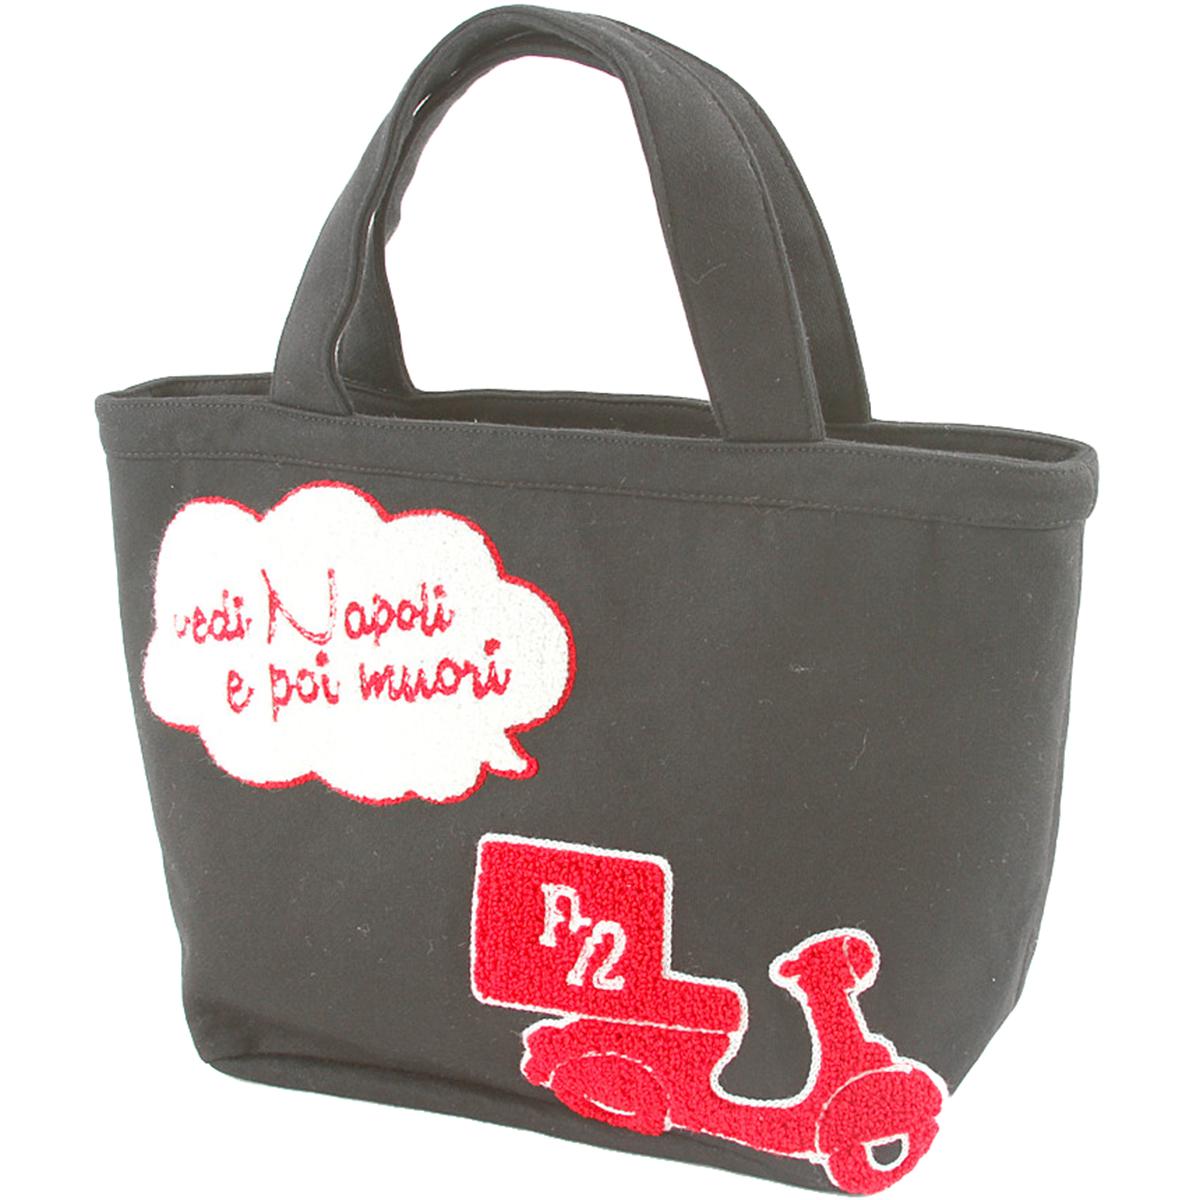 L刺繍入りカートバッグ